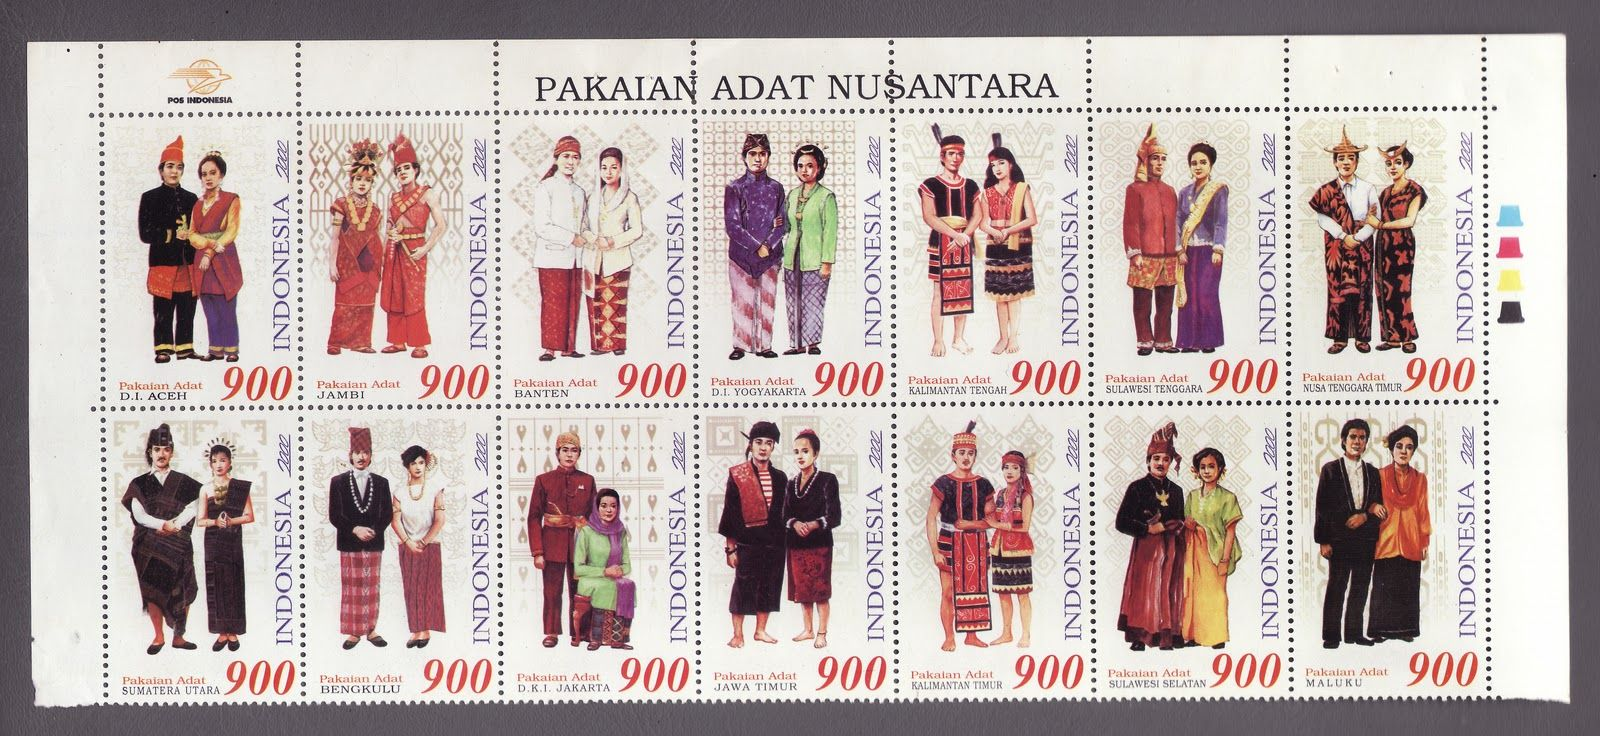 Pakaian Adat Provinsi Indonesia